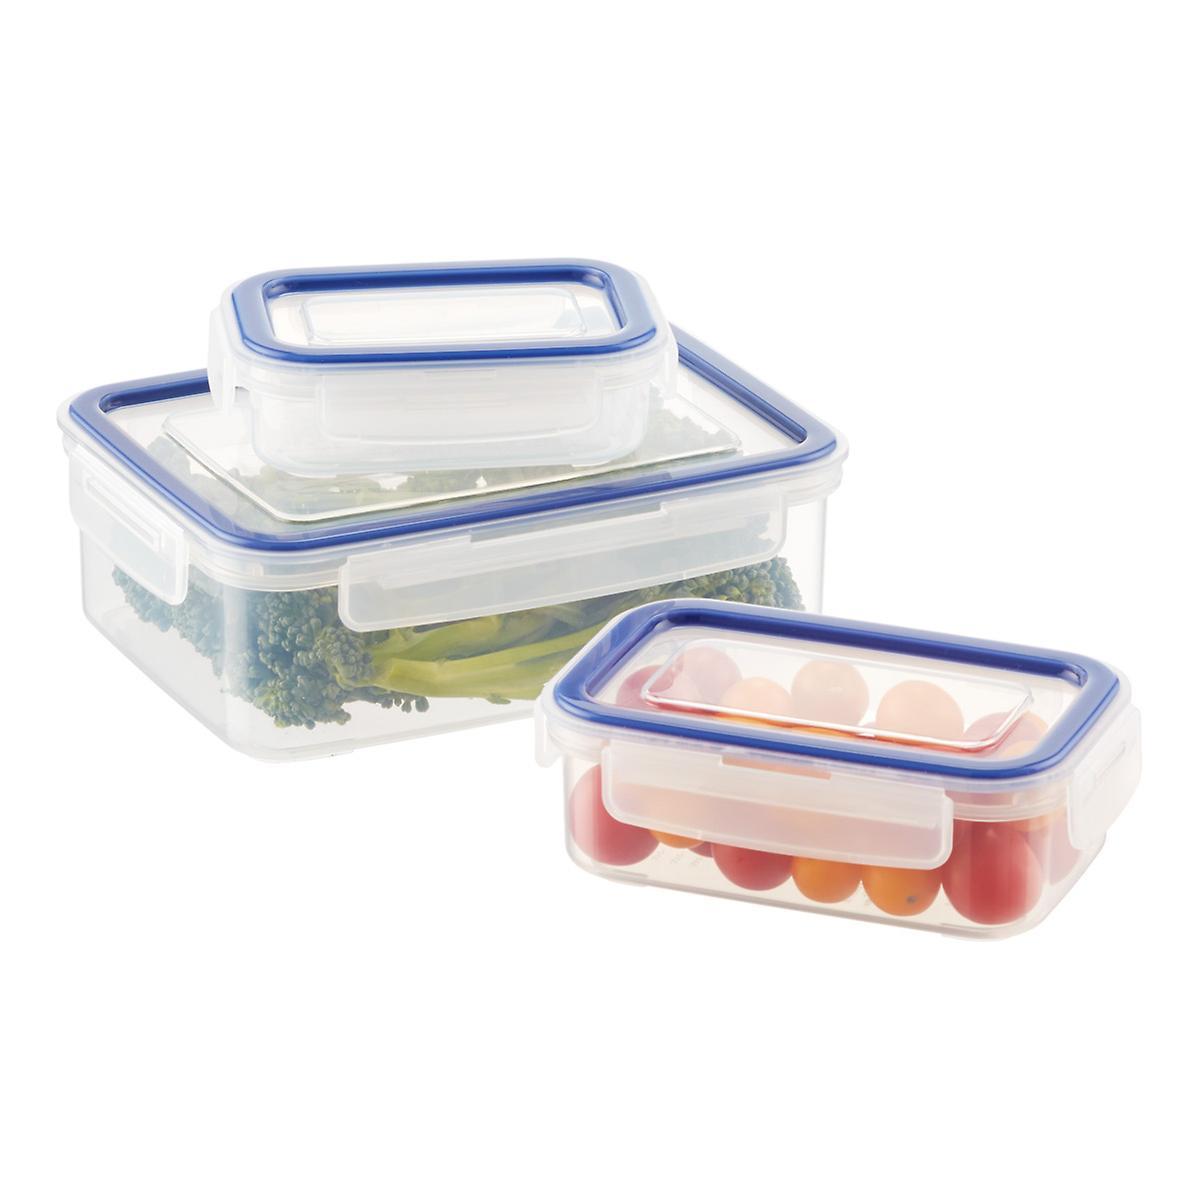 Lustroware Rectangular Food Storage with Silicone Seals